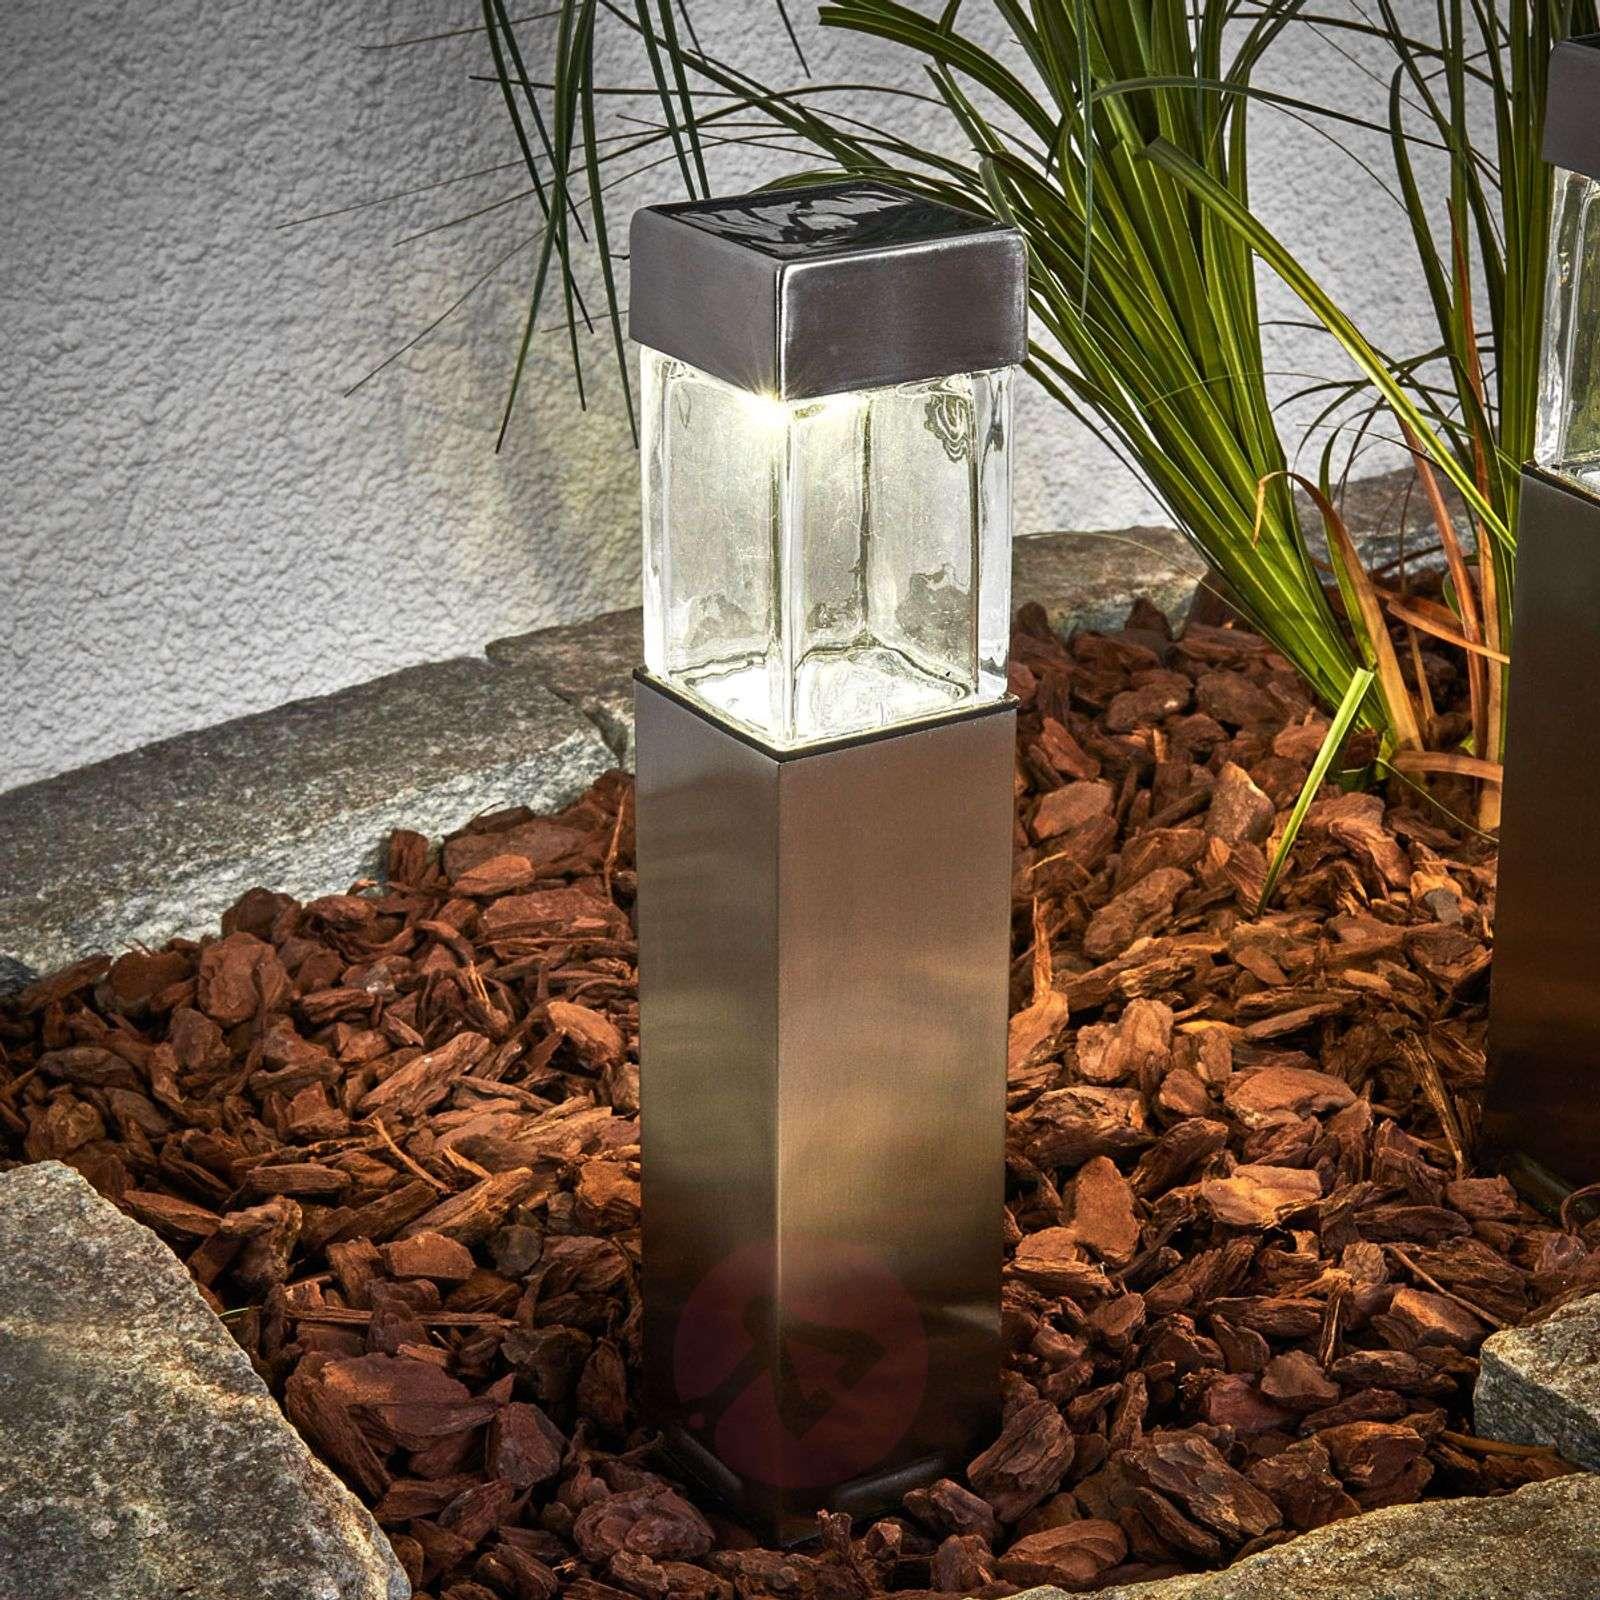 Aurinkokäyttöinen LED-lamppu Barny, 4:n setti-2610007-01